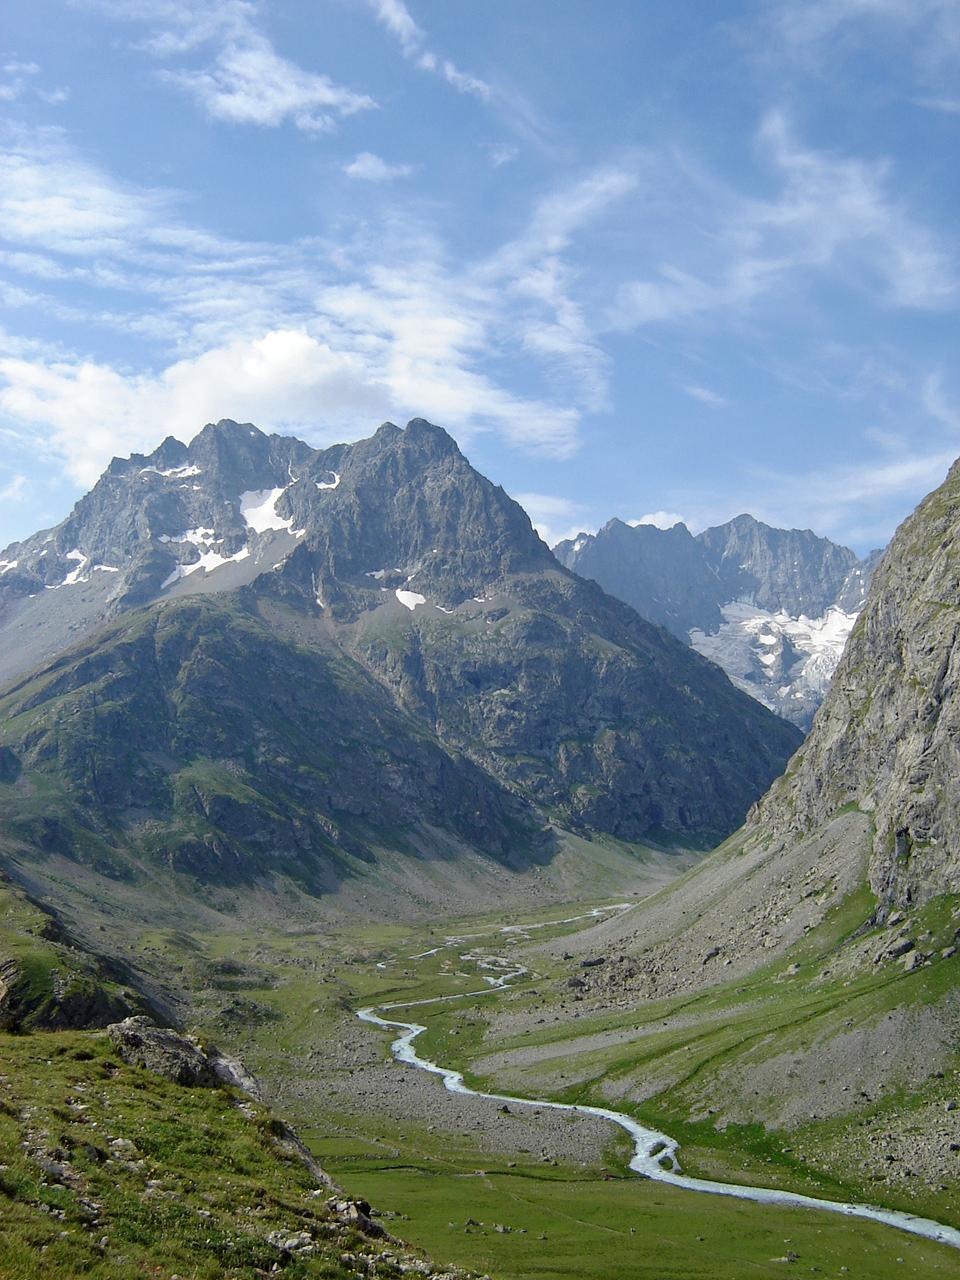 Chamoissière Peaks and Romanche River, Écrins national Park, French Alps